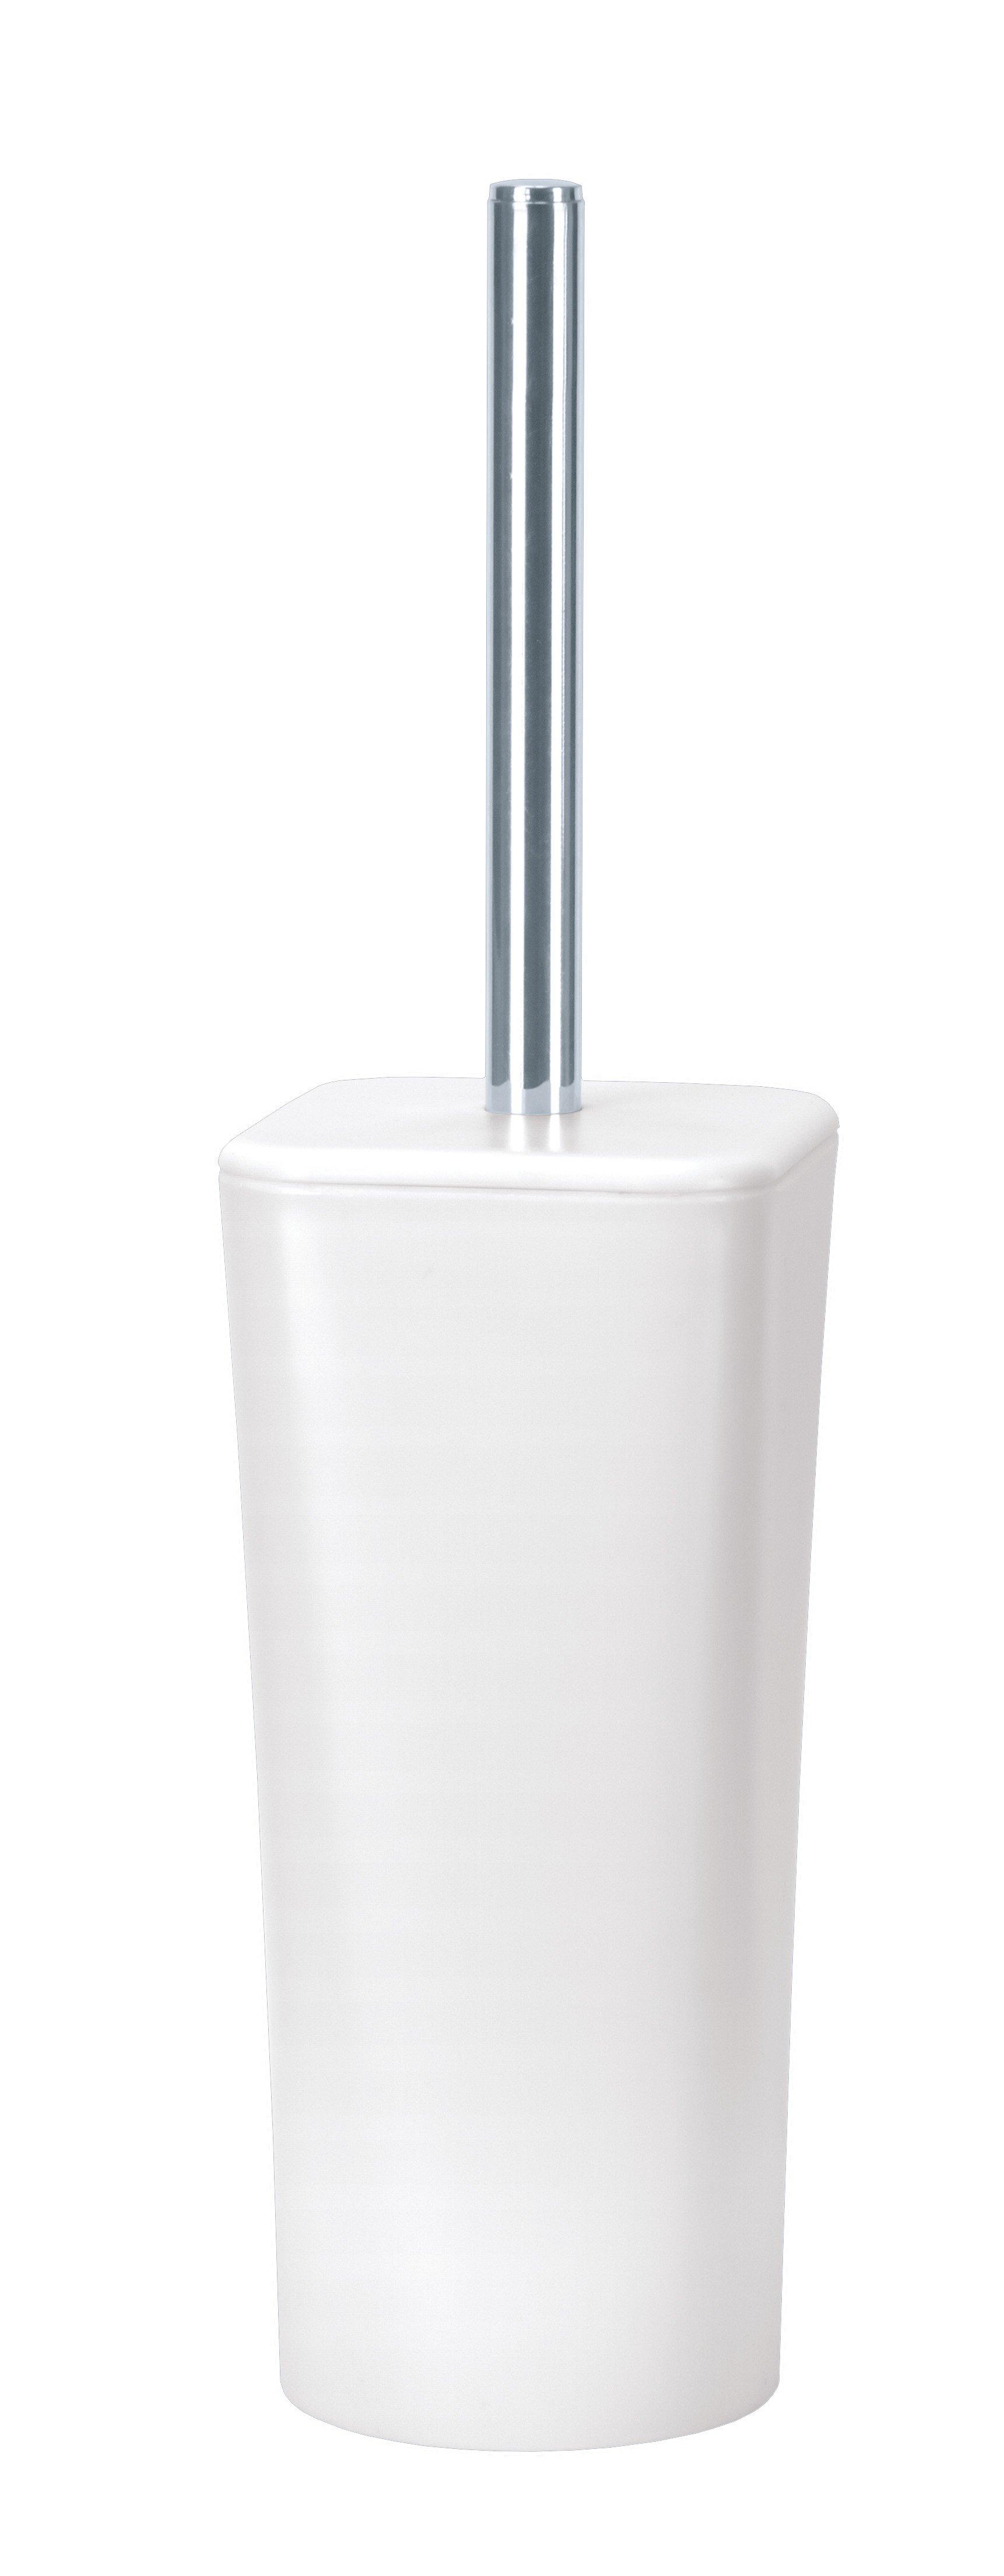 WC-Bürstenhalter Plenty Weiss B:9,3cm